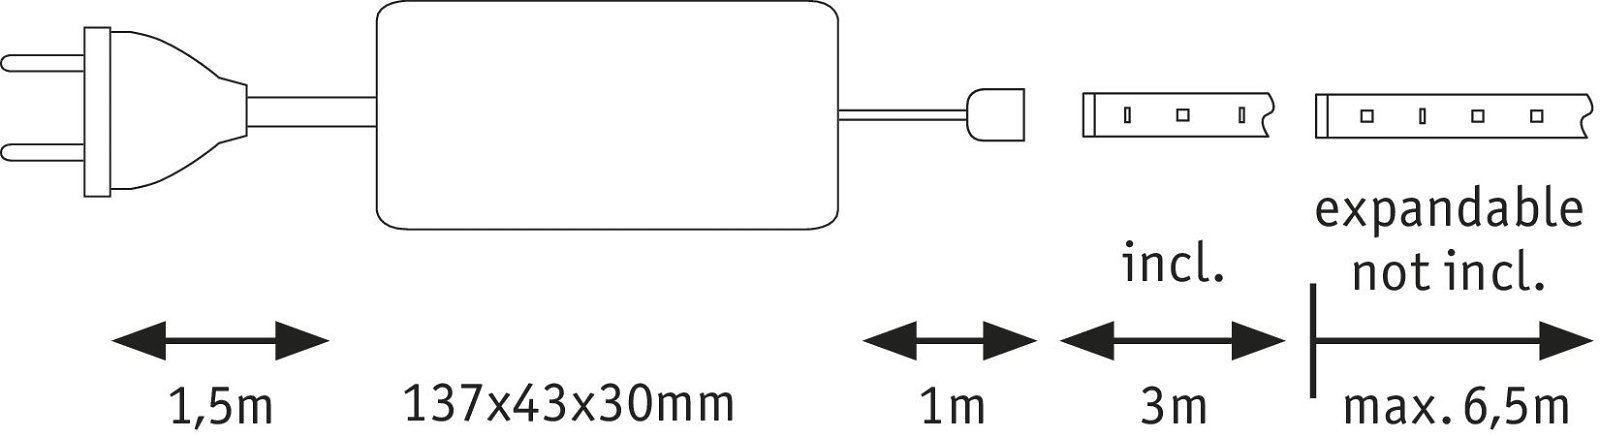 MaxLED 500 LED Strip Daglichtwit 3m gecoat 18W 1650lm 6500K 36VA